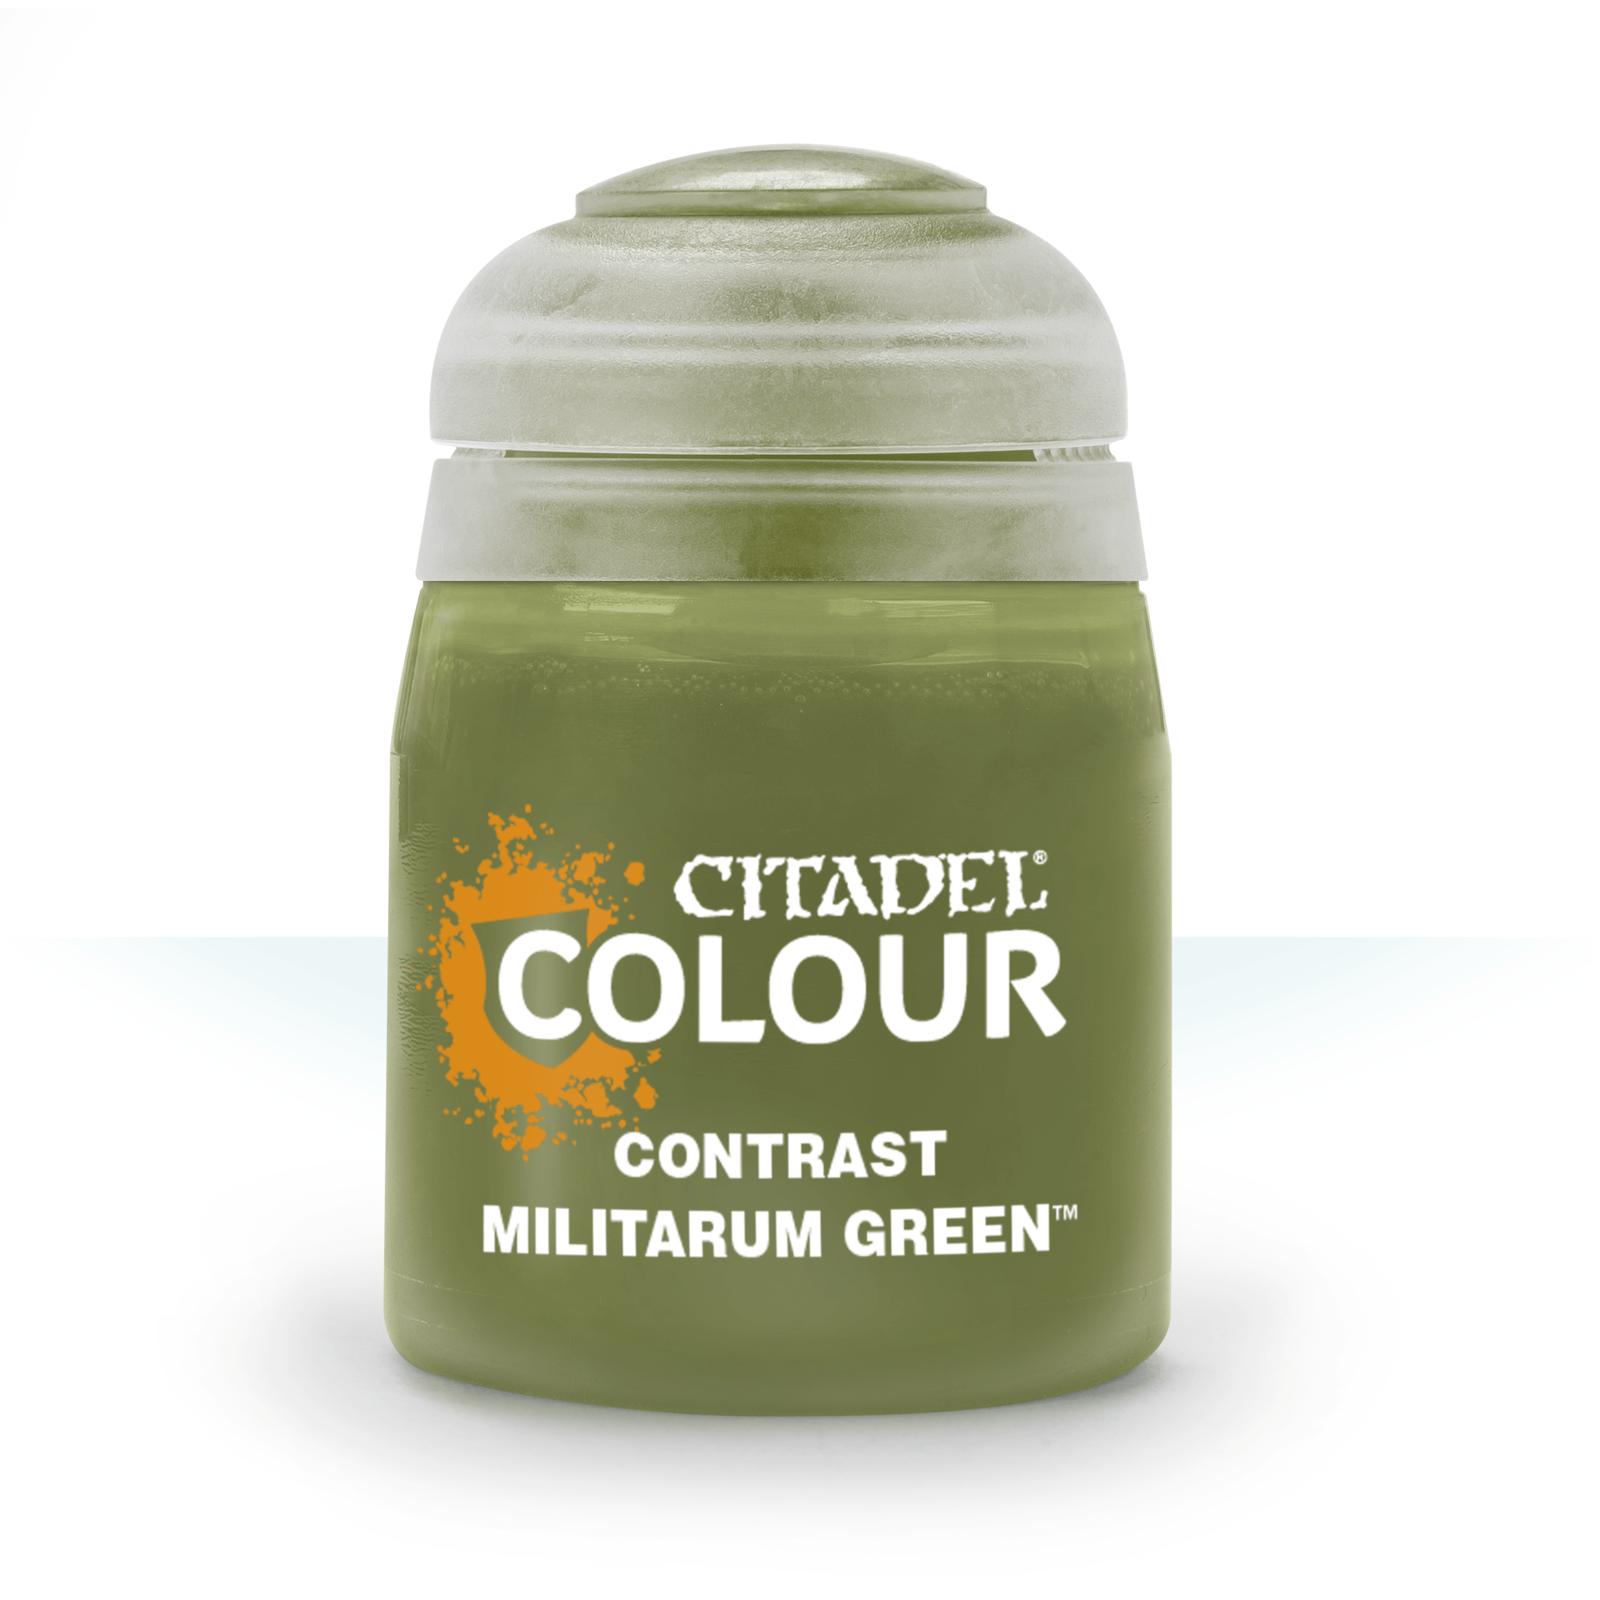 Citadel Paint Contrast: Militarum Green